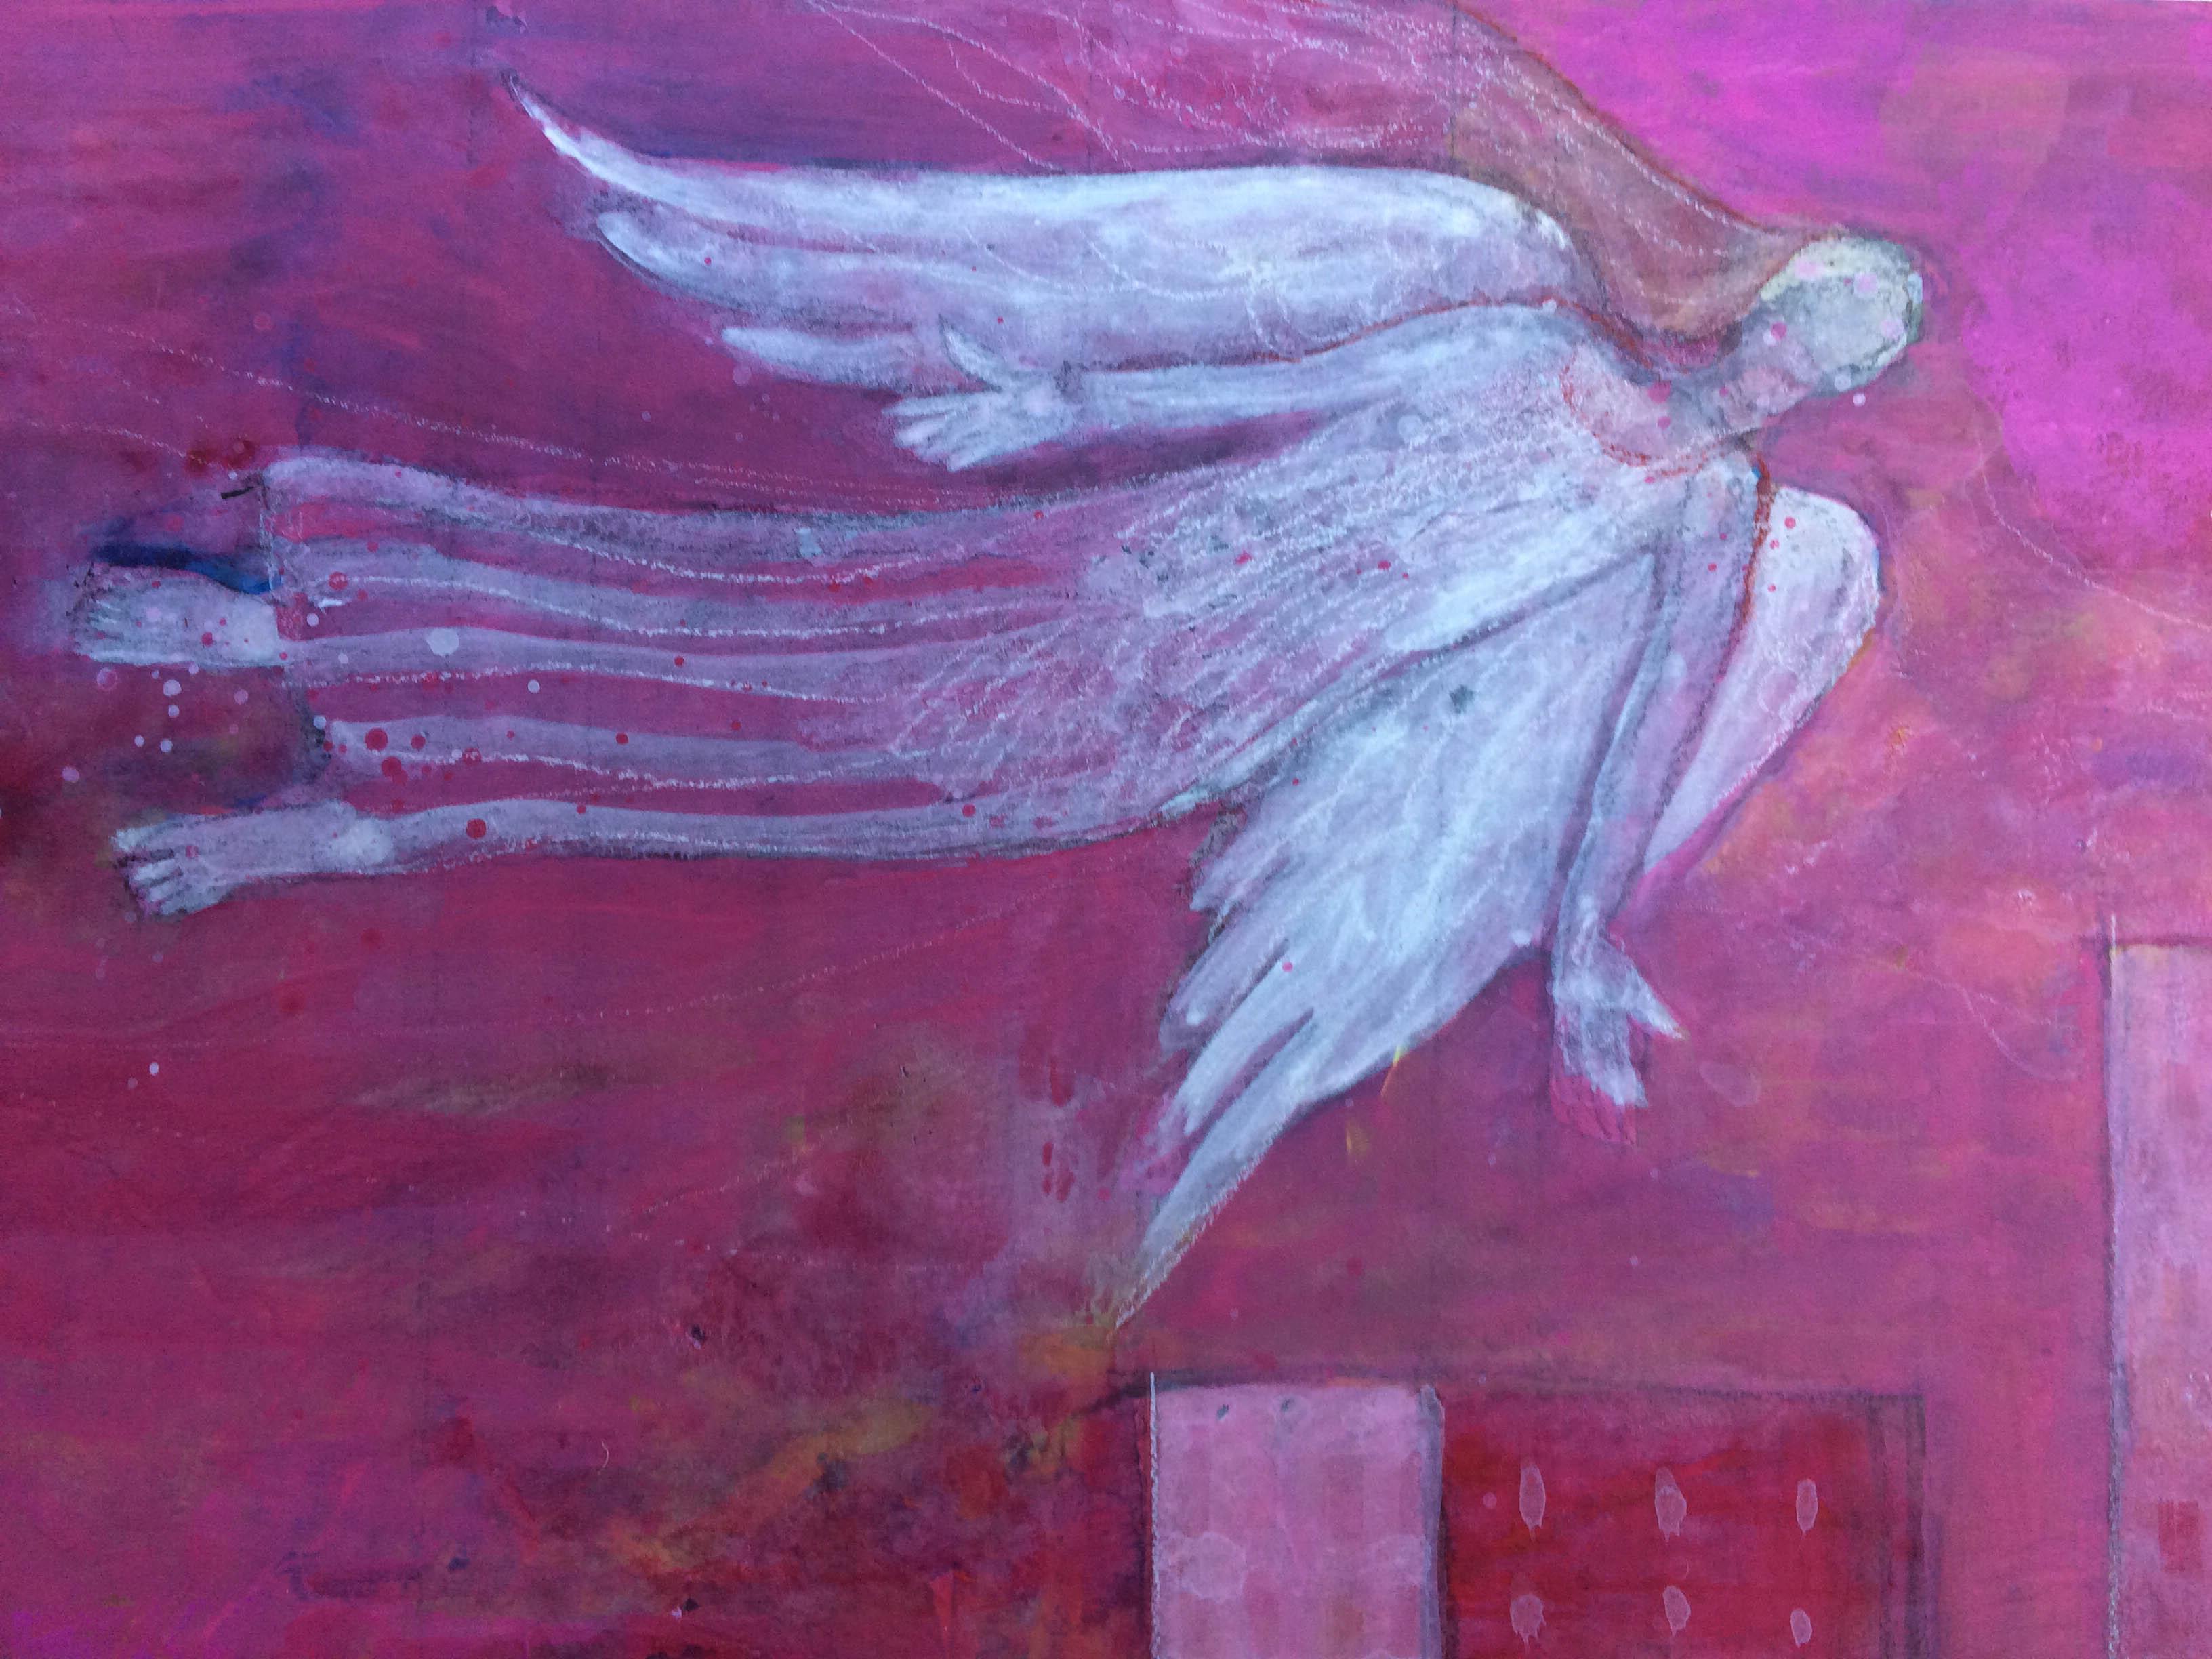 gli angeli tra noi p1